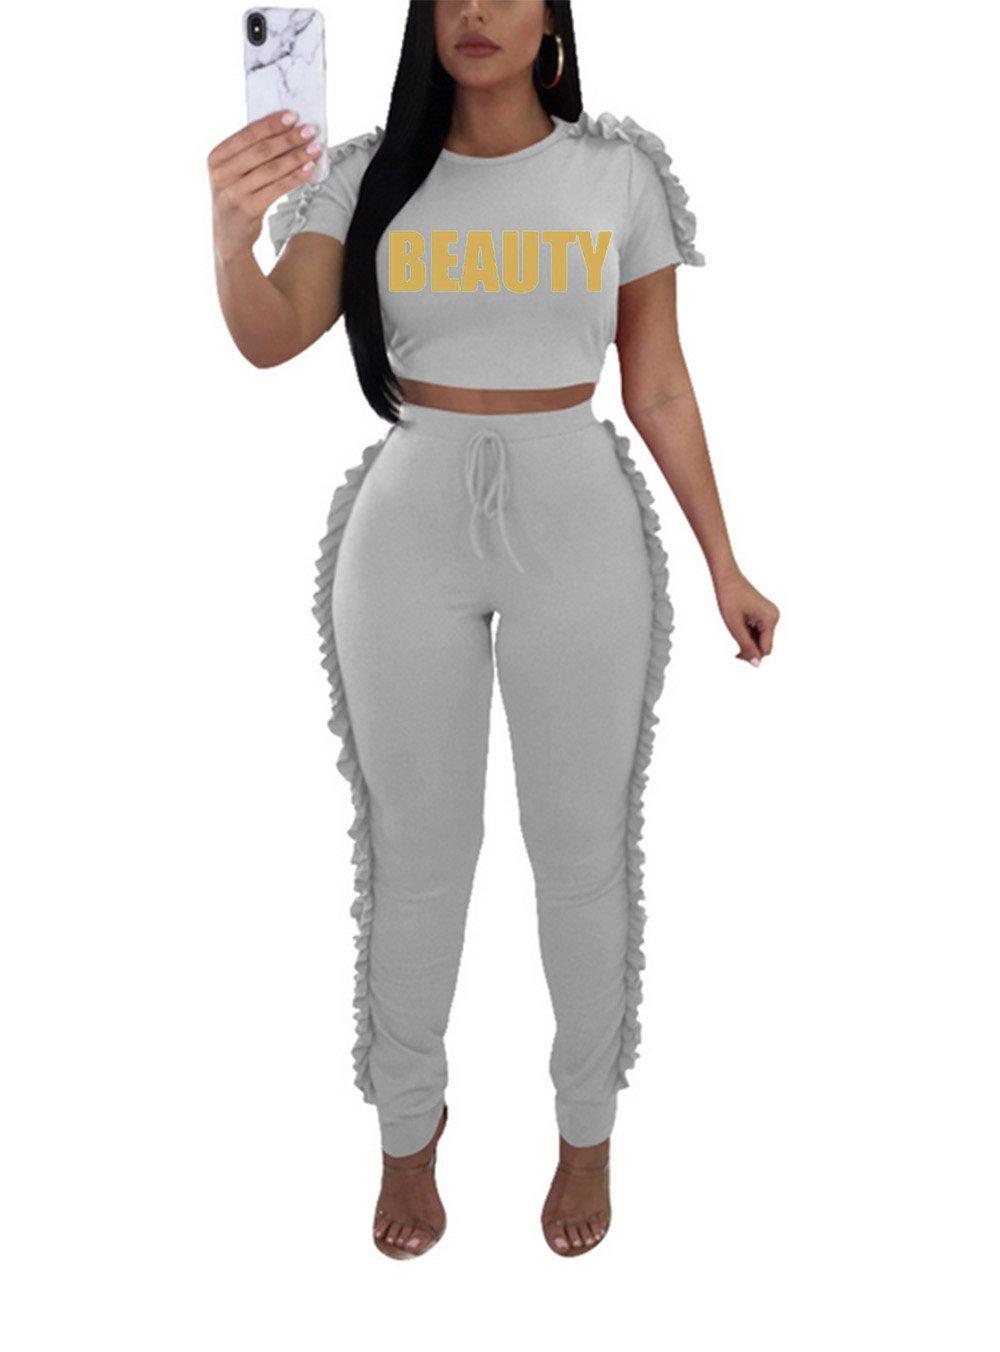 Lovelyduo Women's Short Sleeve Crop Top and Flouncing Long Pant Set Tracksuits Gray L